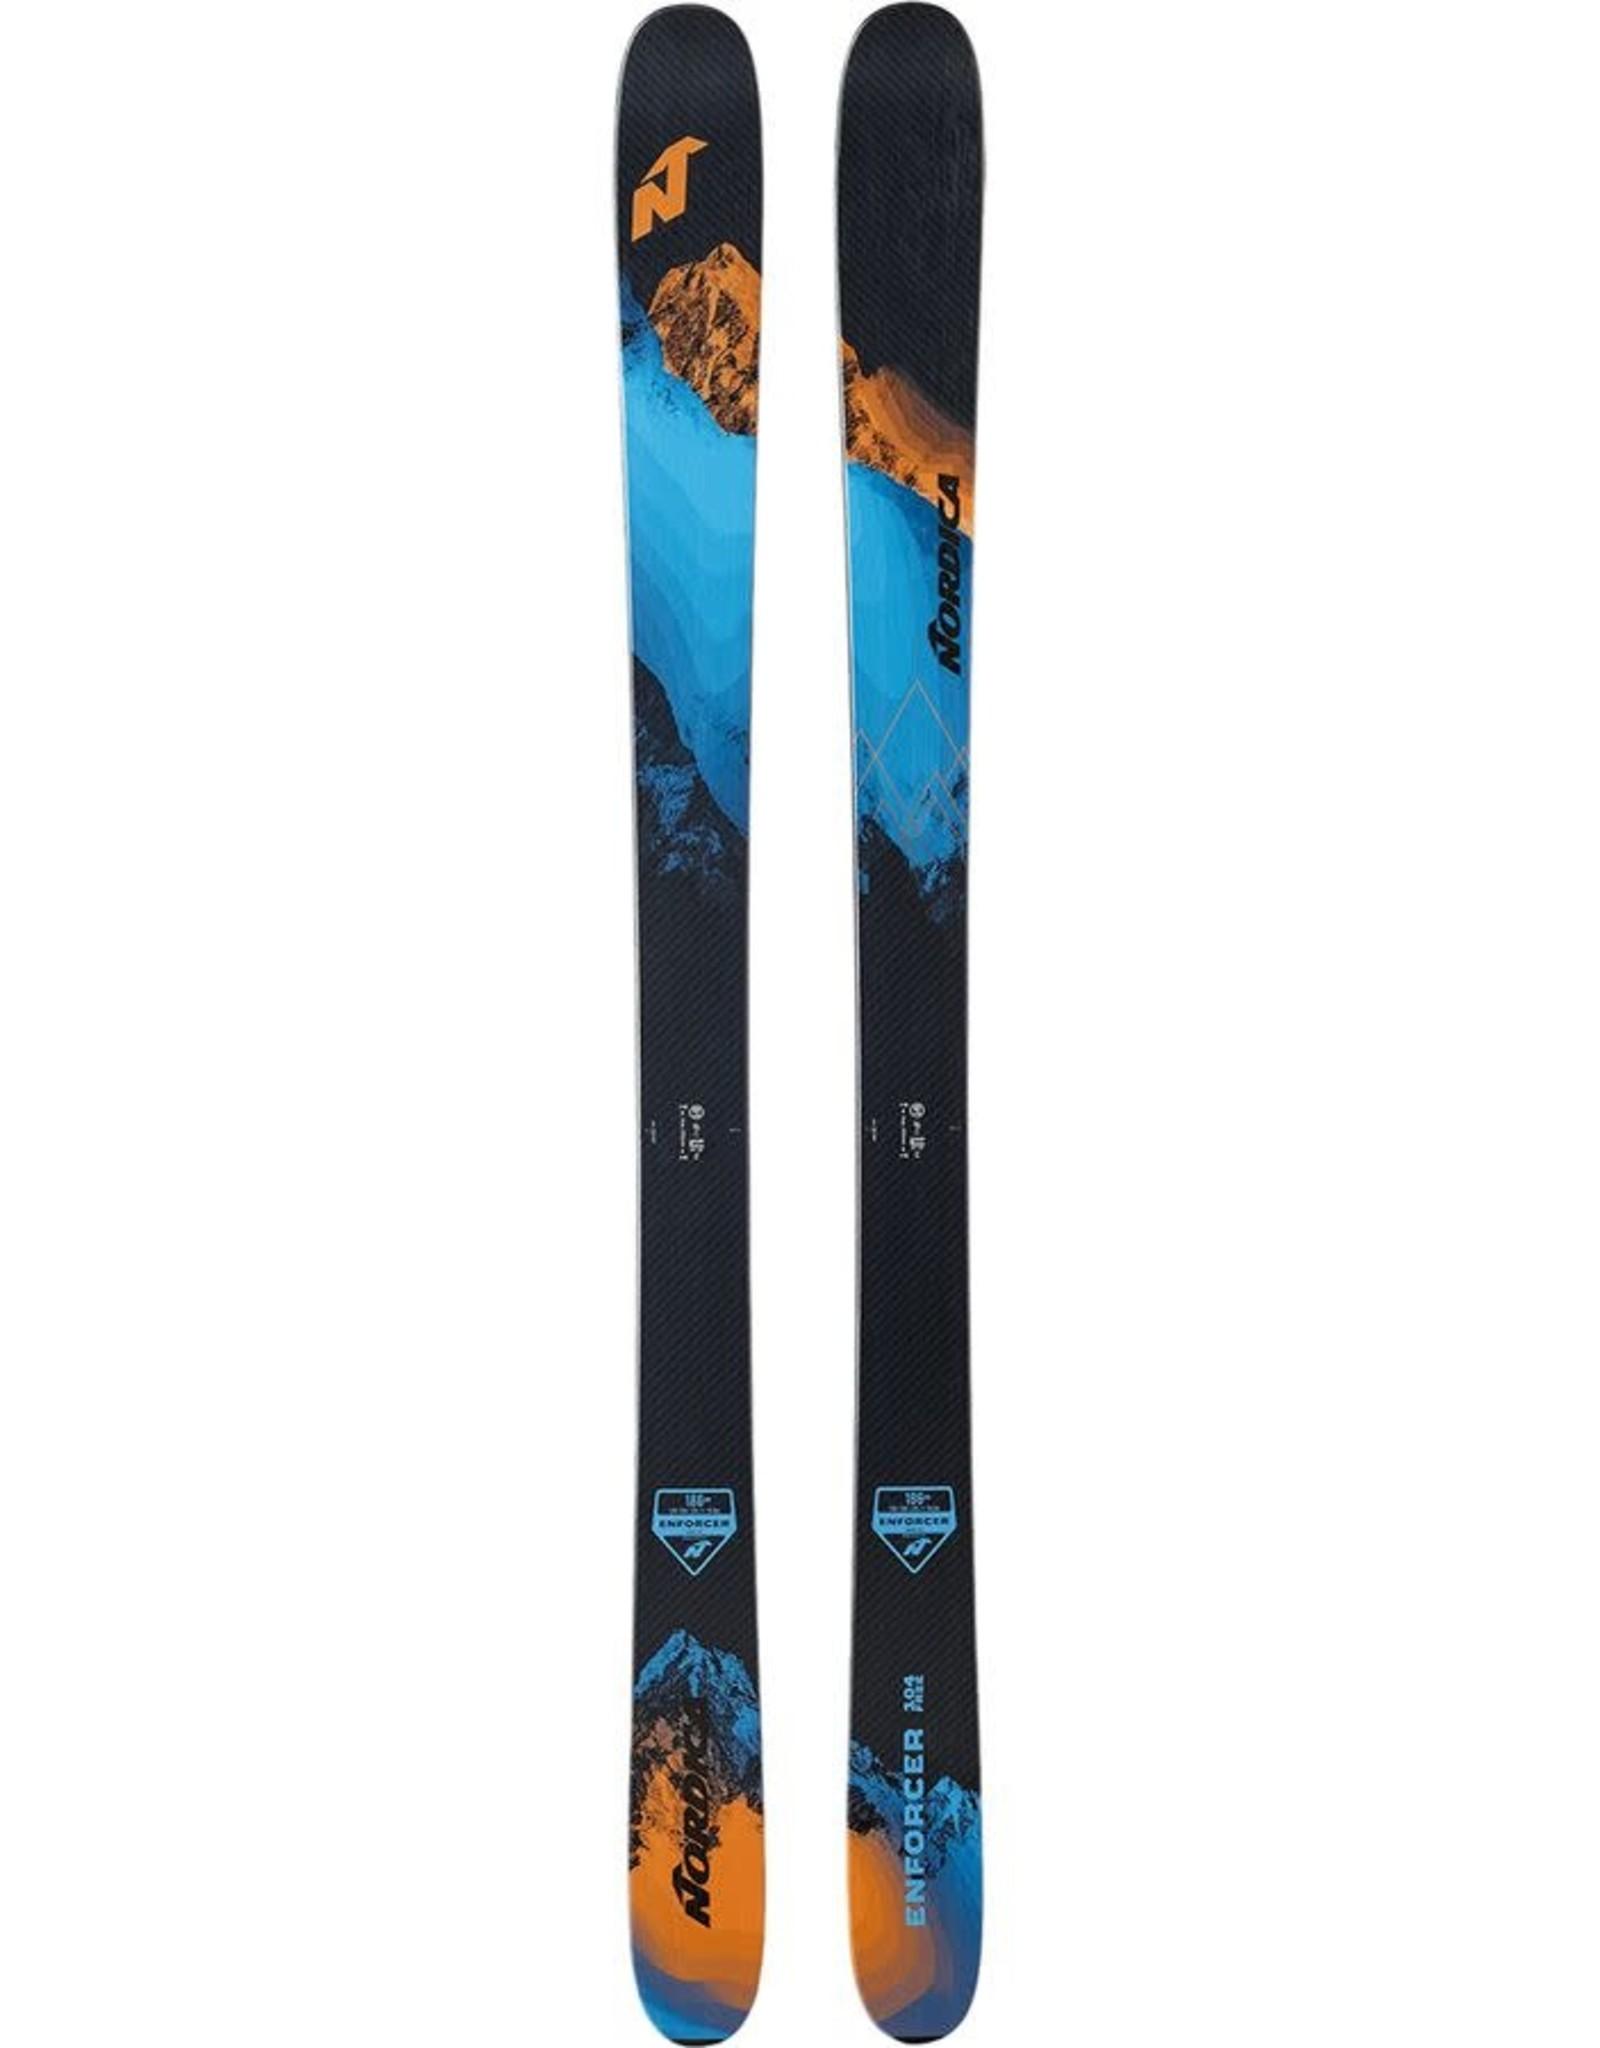 NORDICA NORDICA Skis ENFORCER 104 FREE (20/21)